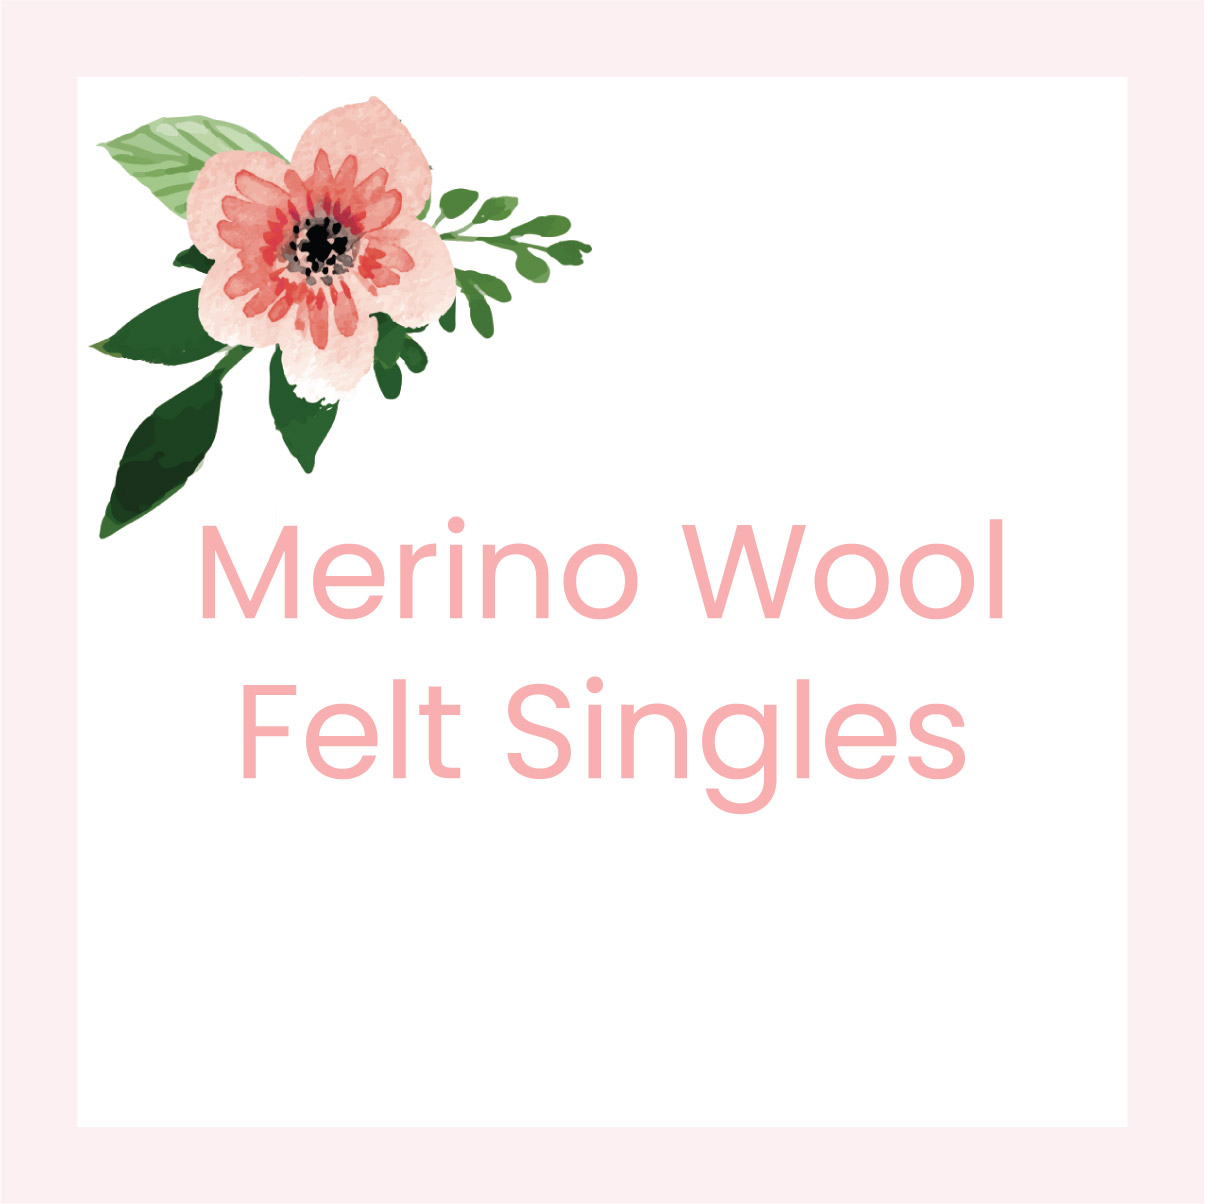 Merino Wool Felt Singles